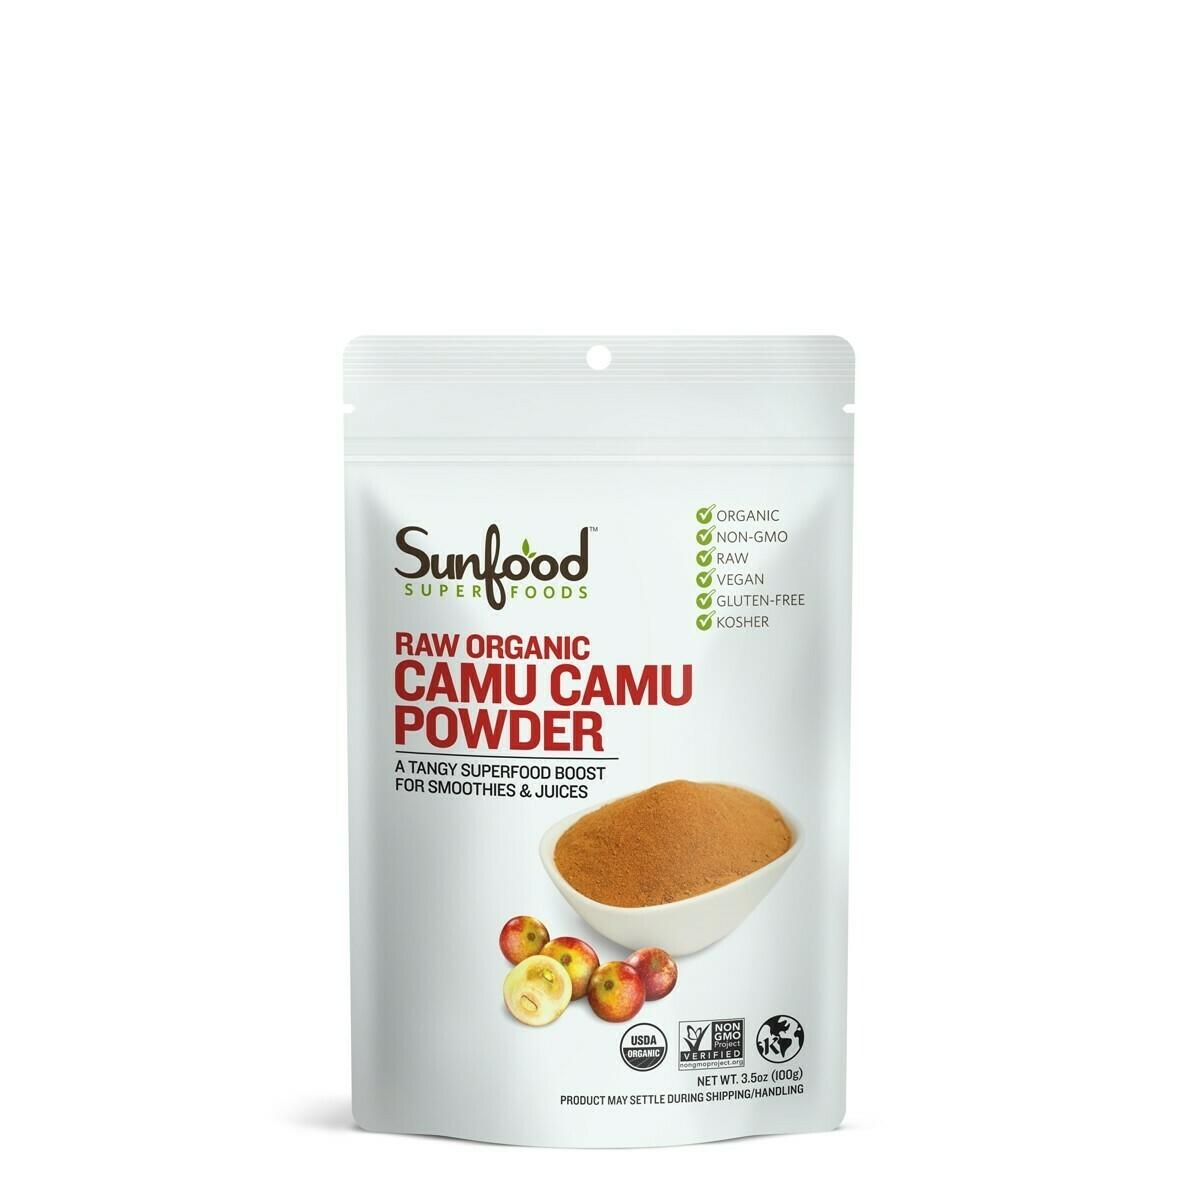 Sunfood-Raw Organic Camu Camu Powder- 3.5oz